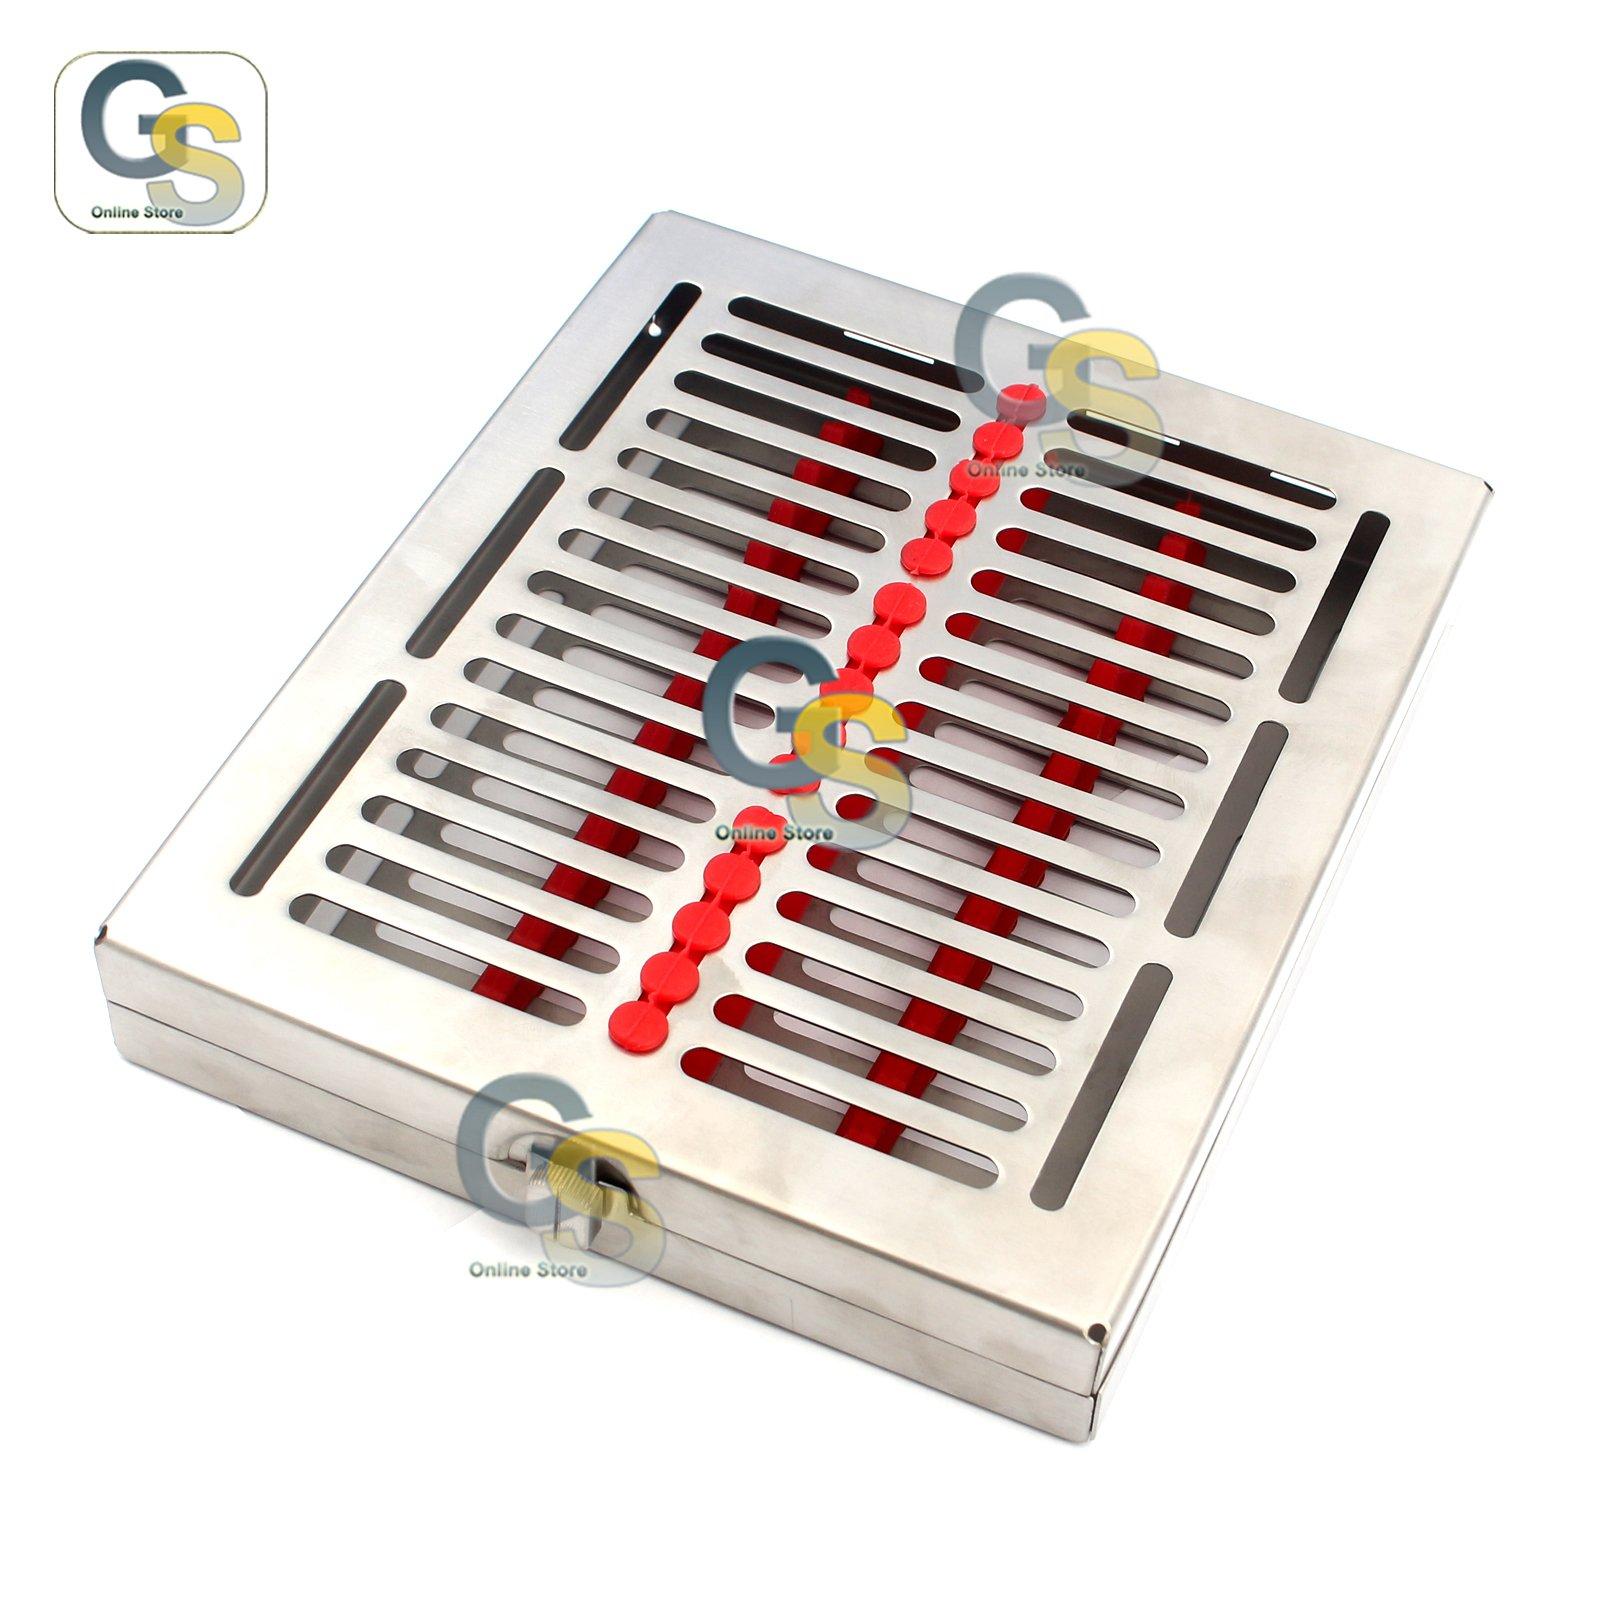 G.S DENTAL 15 INSTRUMENTS STERILIZATION CASSETTE TURN LOCK ST-003 BEST QUALITY